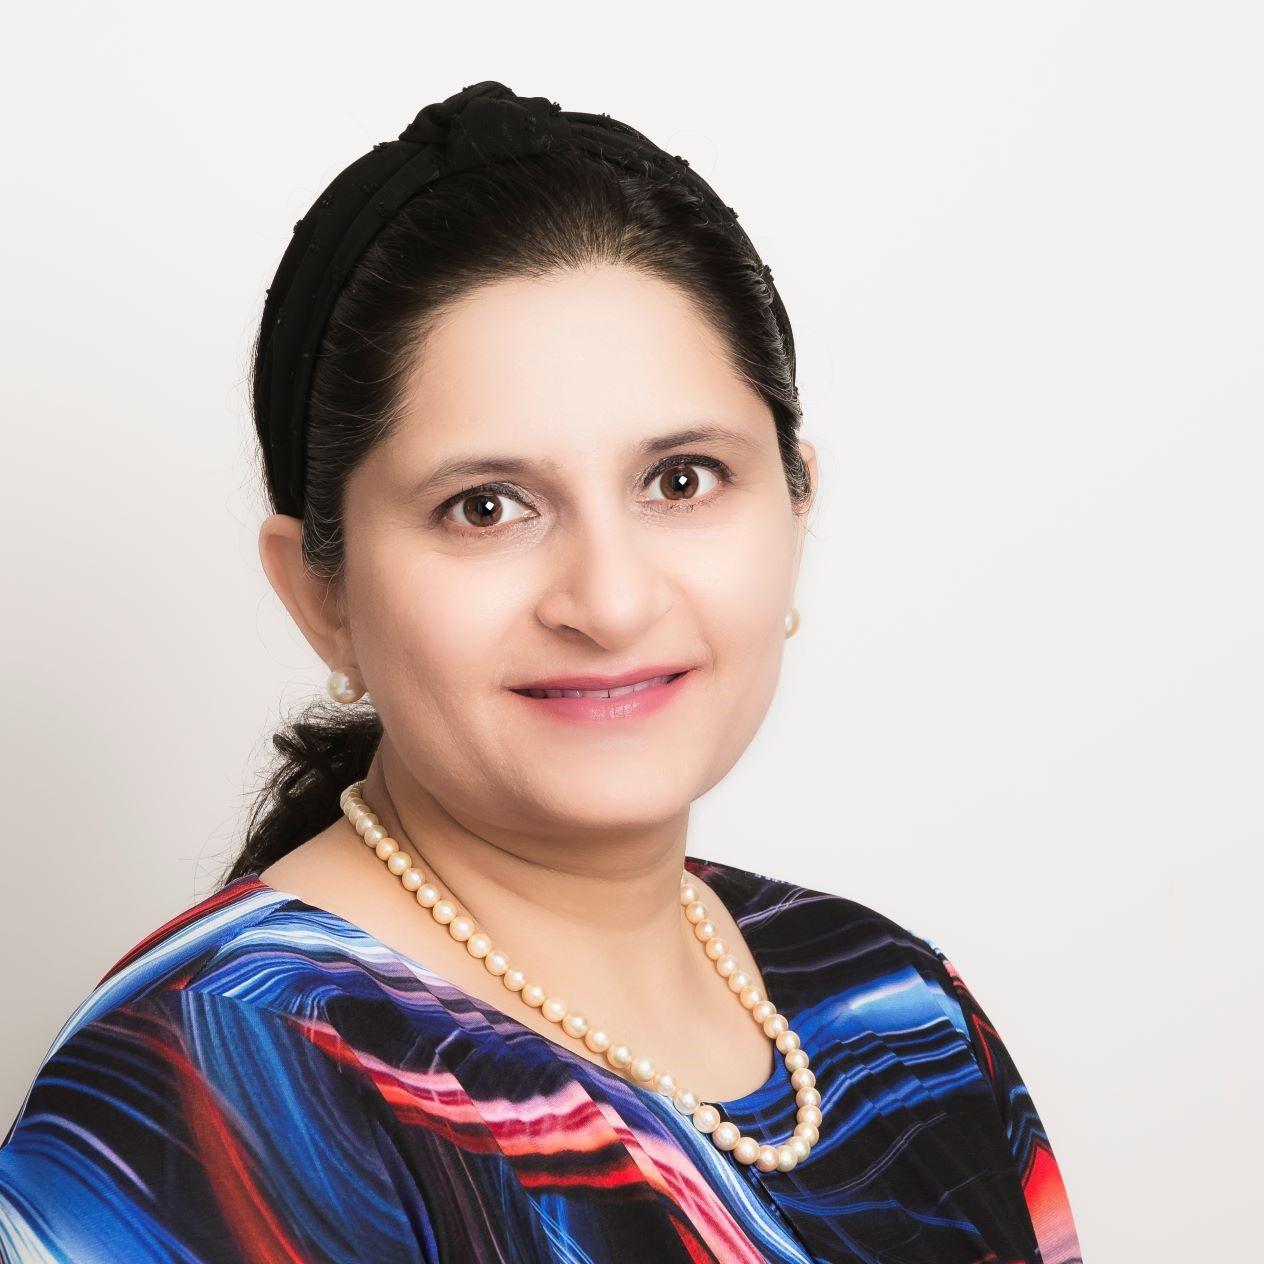 Ruchi Pathak Kaul